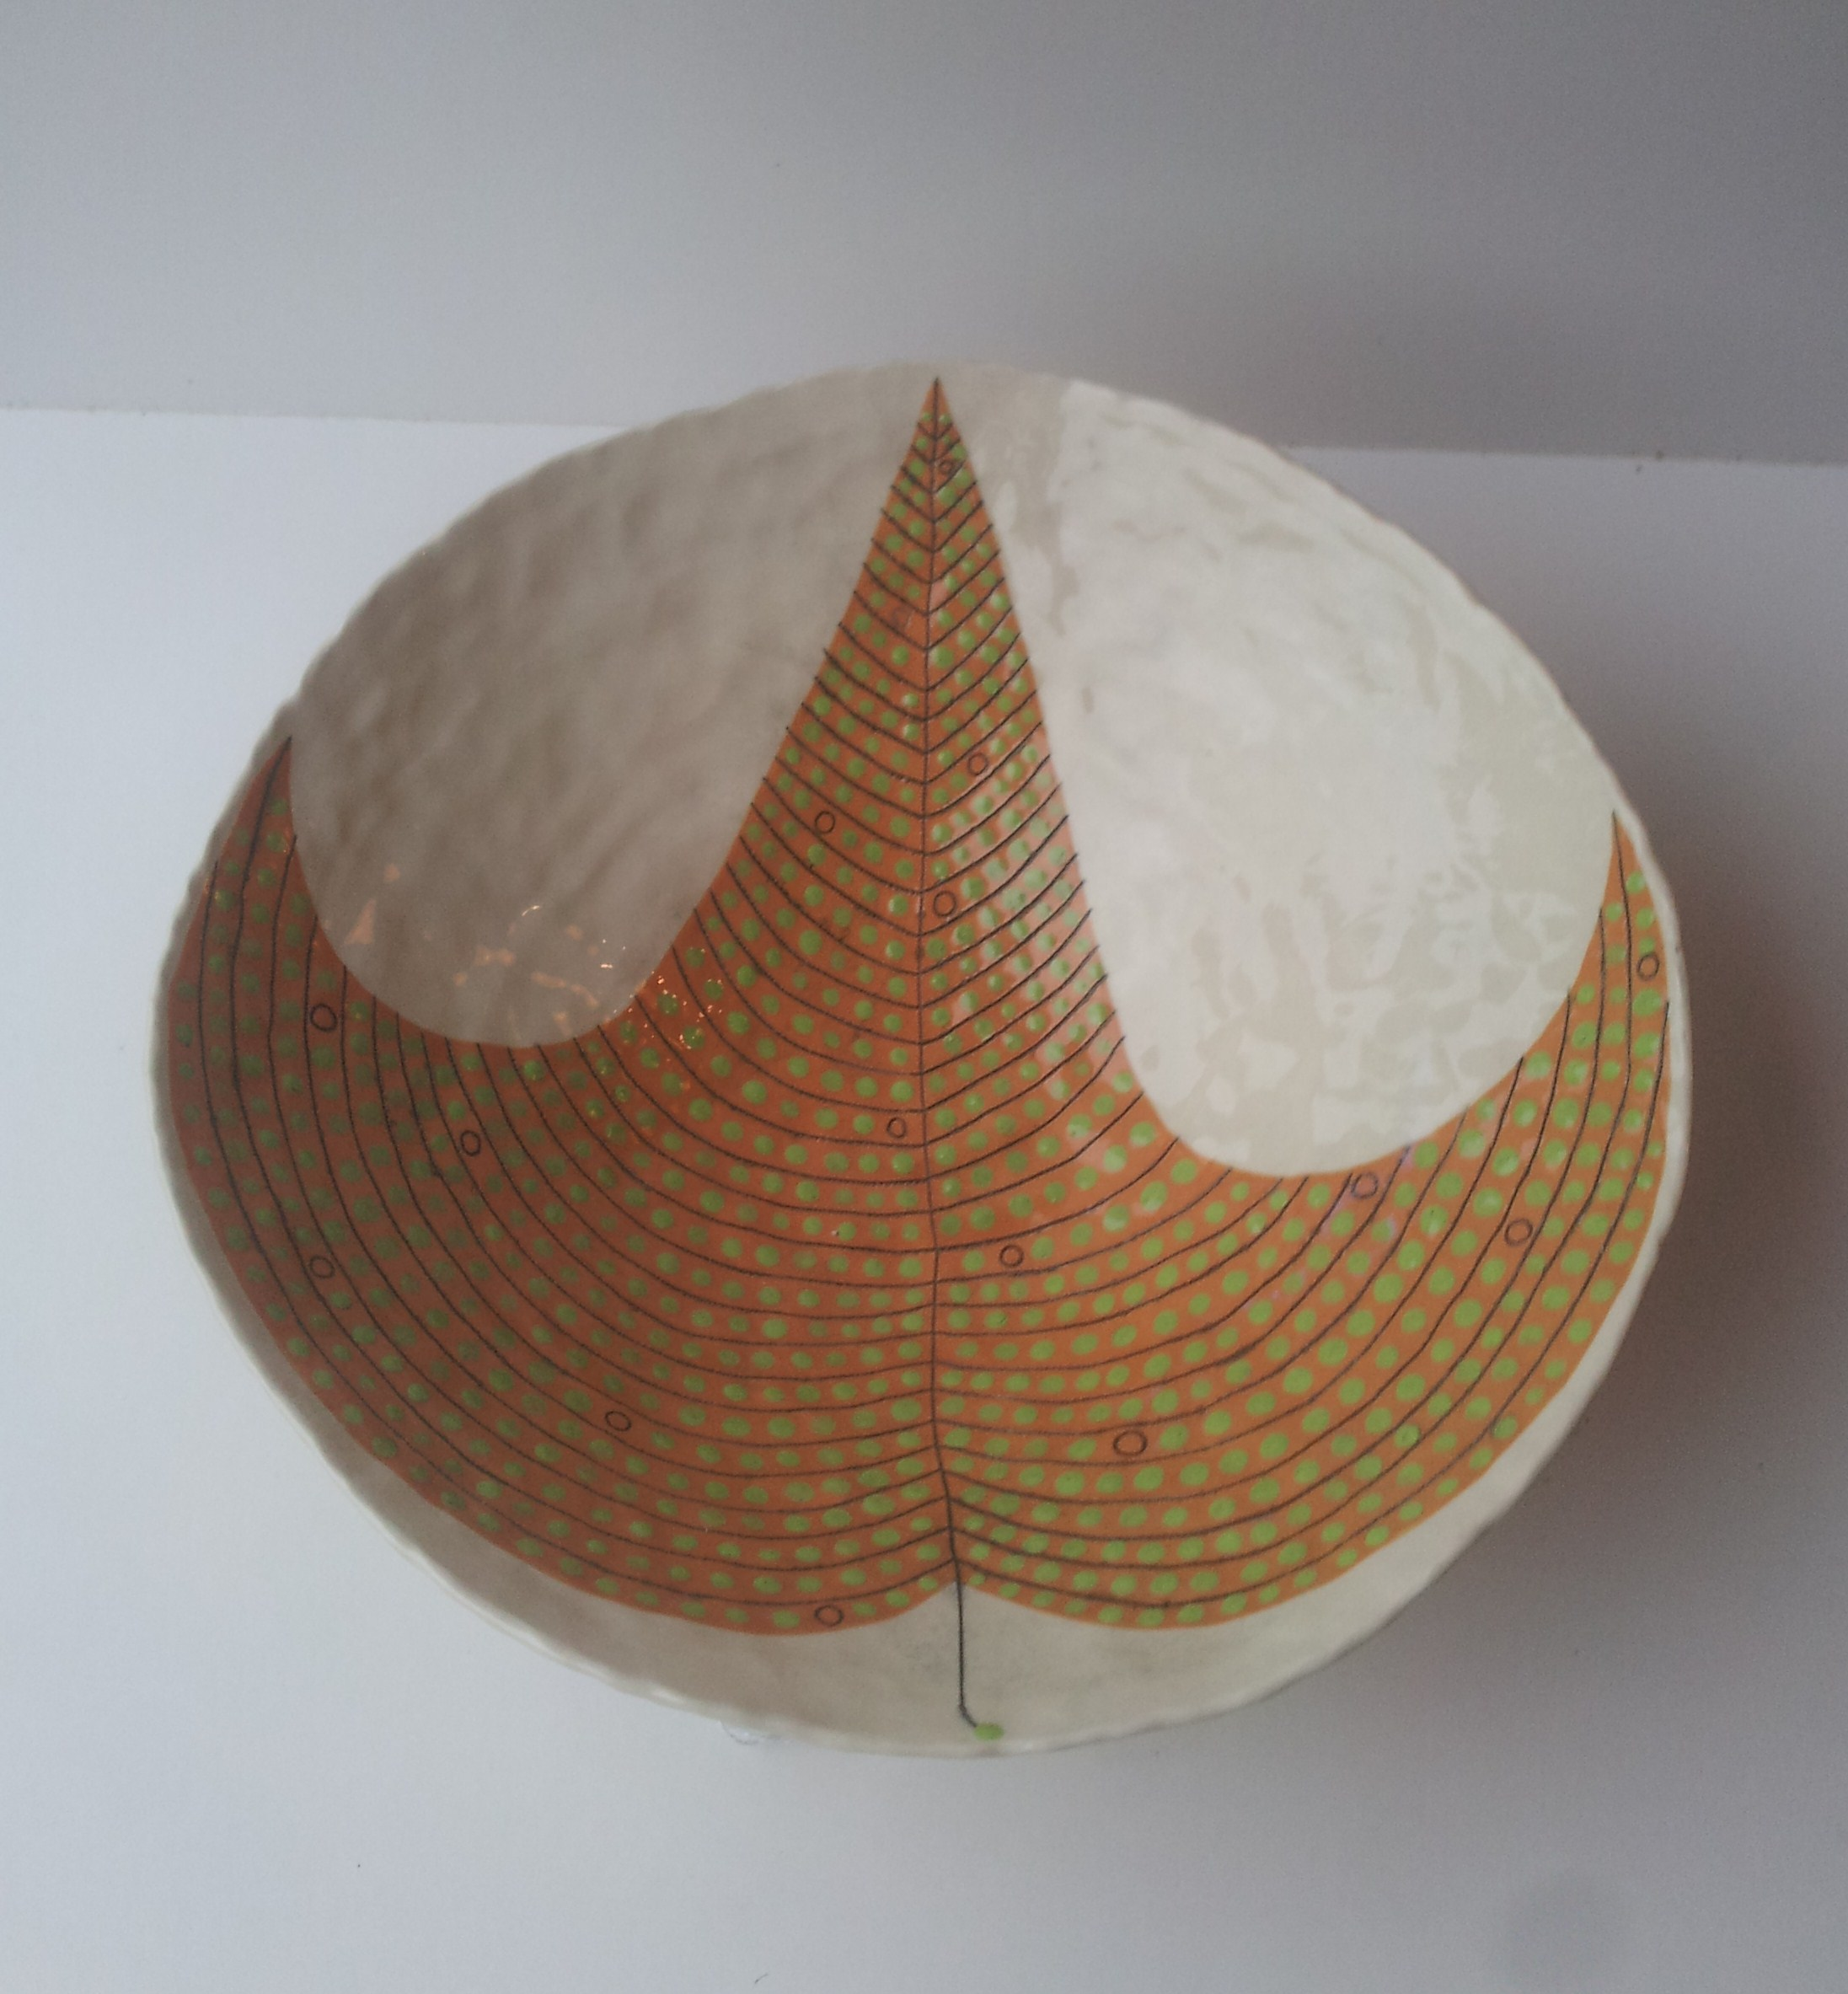 Andrew Ludick, Orange Leaf Bowl, glazed ceramic, 25cm, EUR270